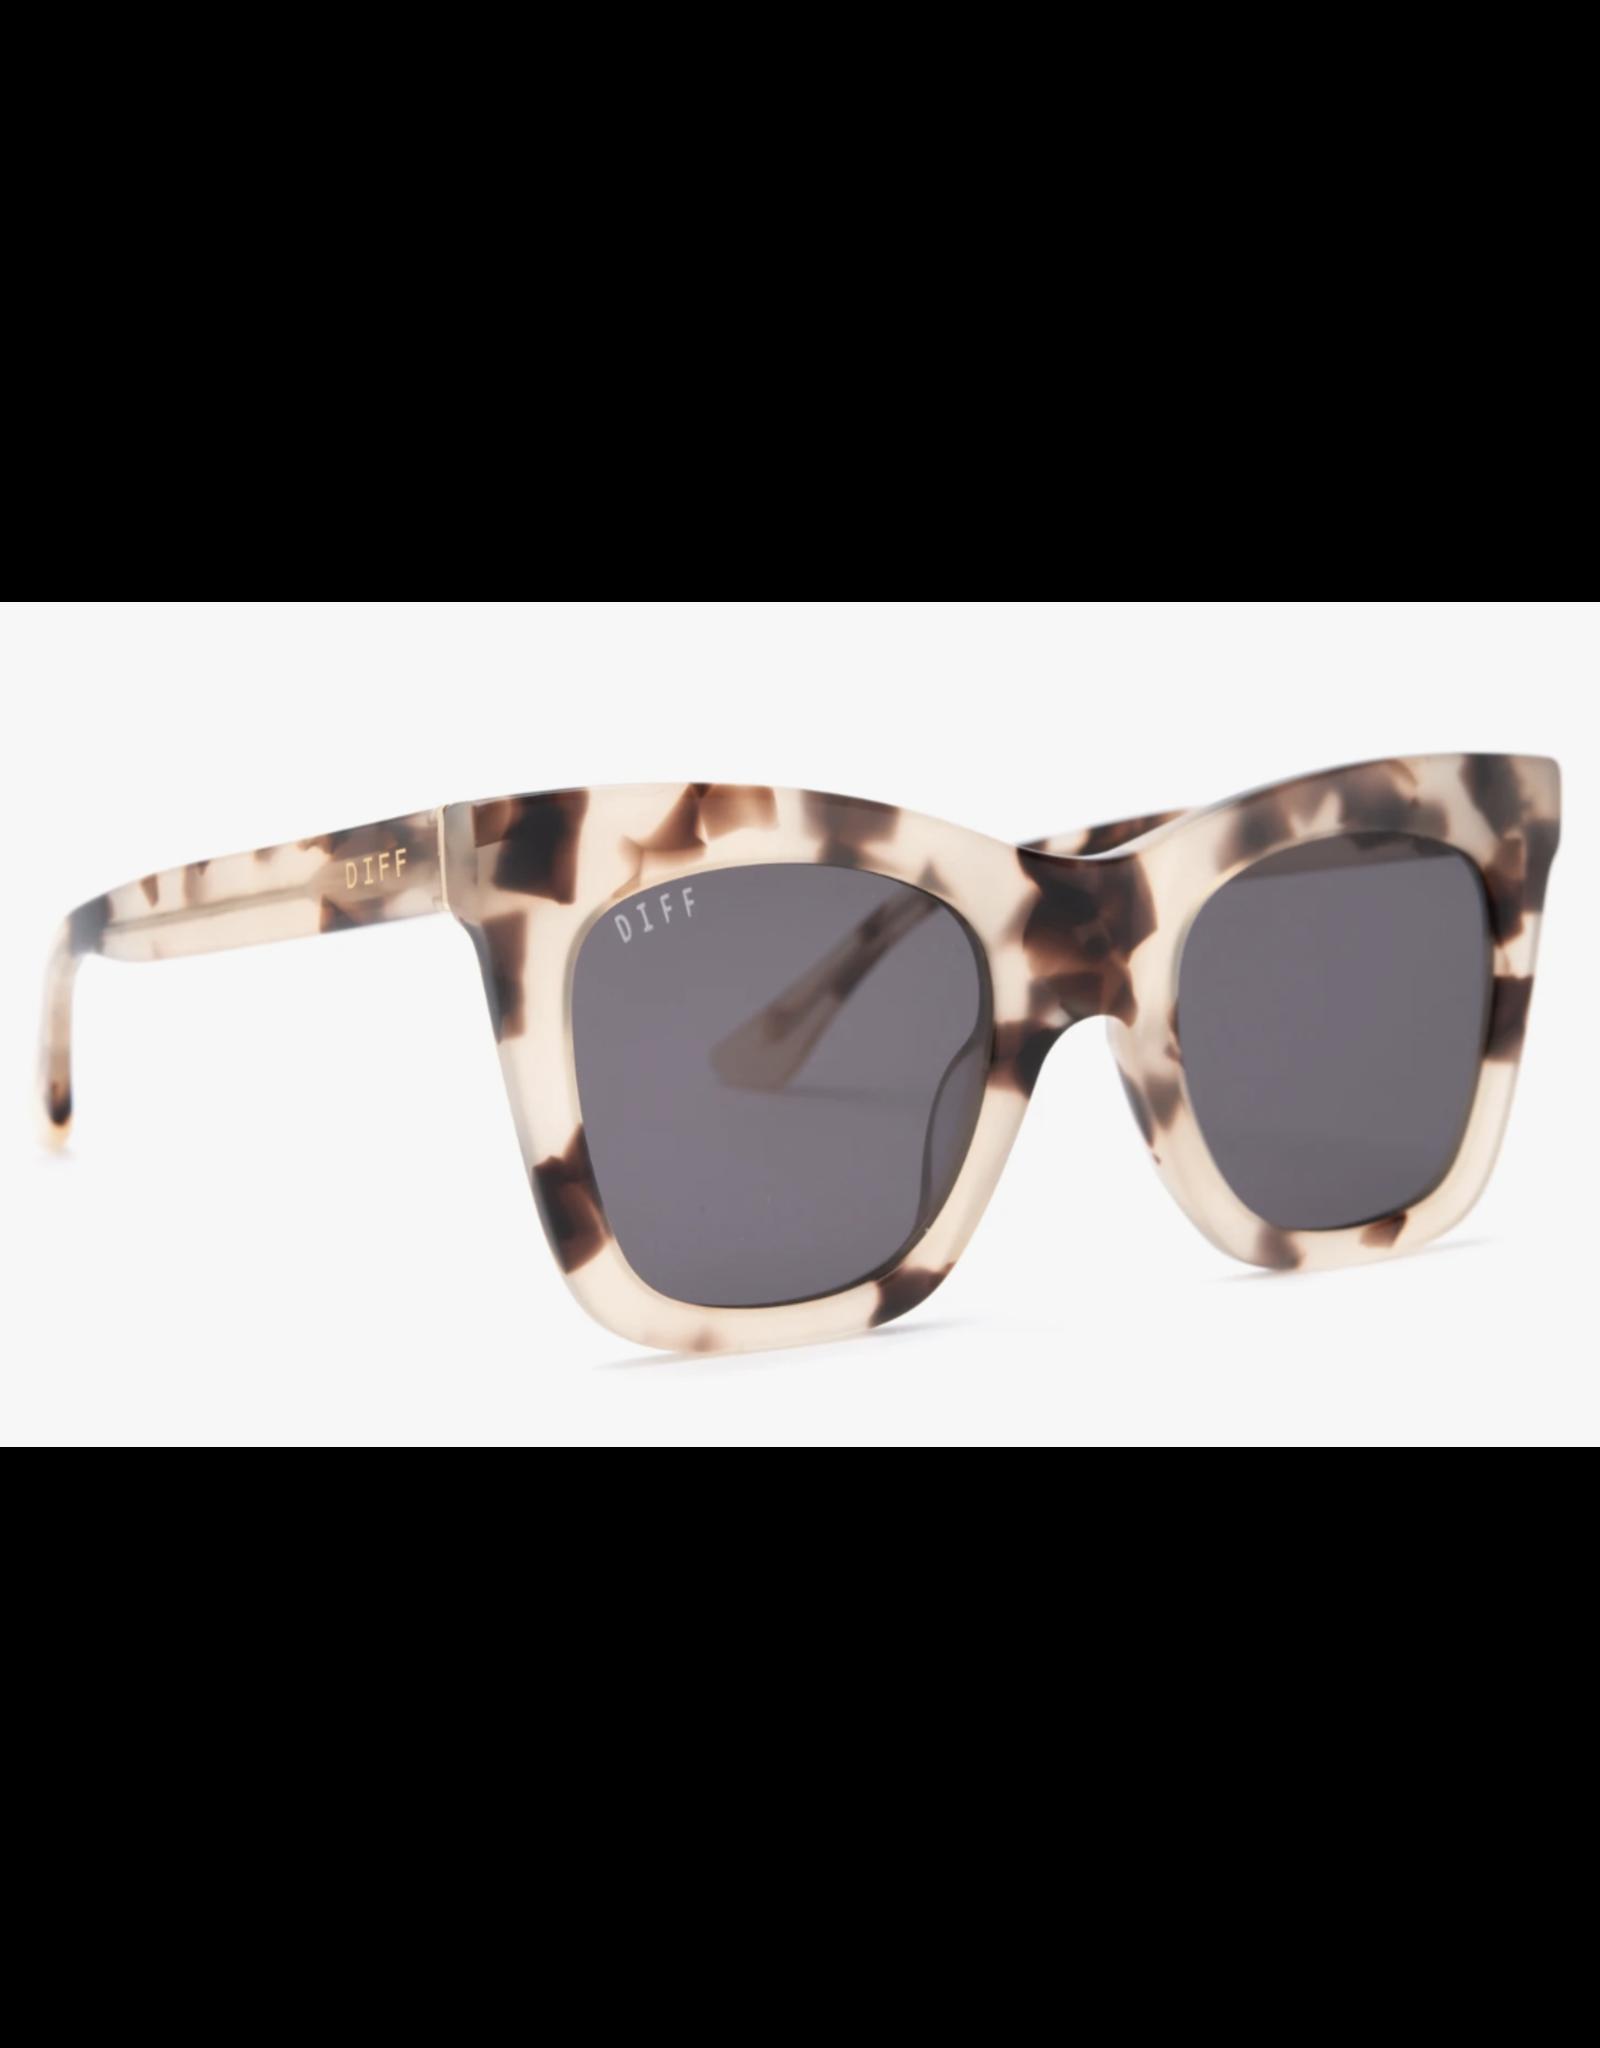 Diff Eyewear Kaia Sunglasses